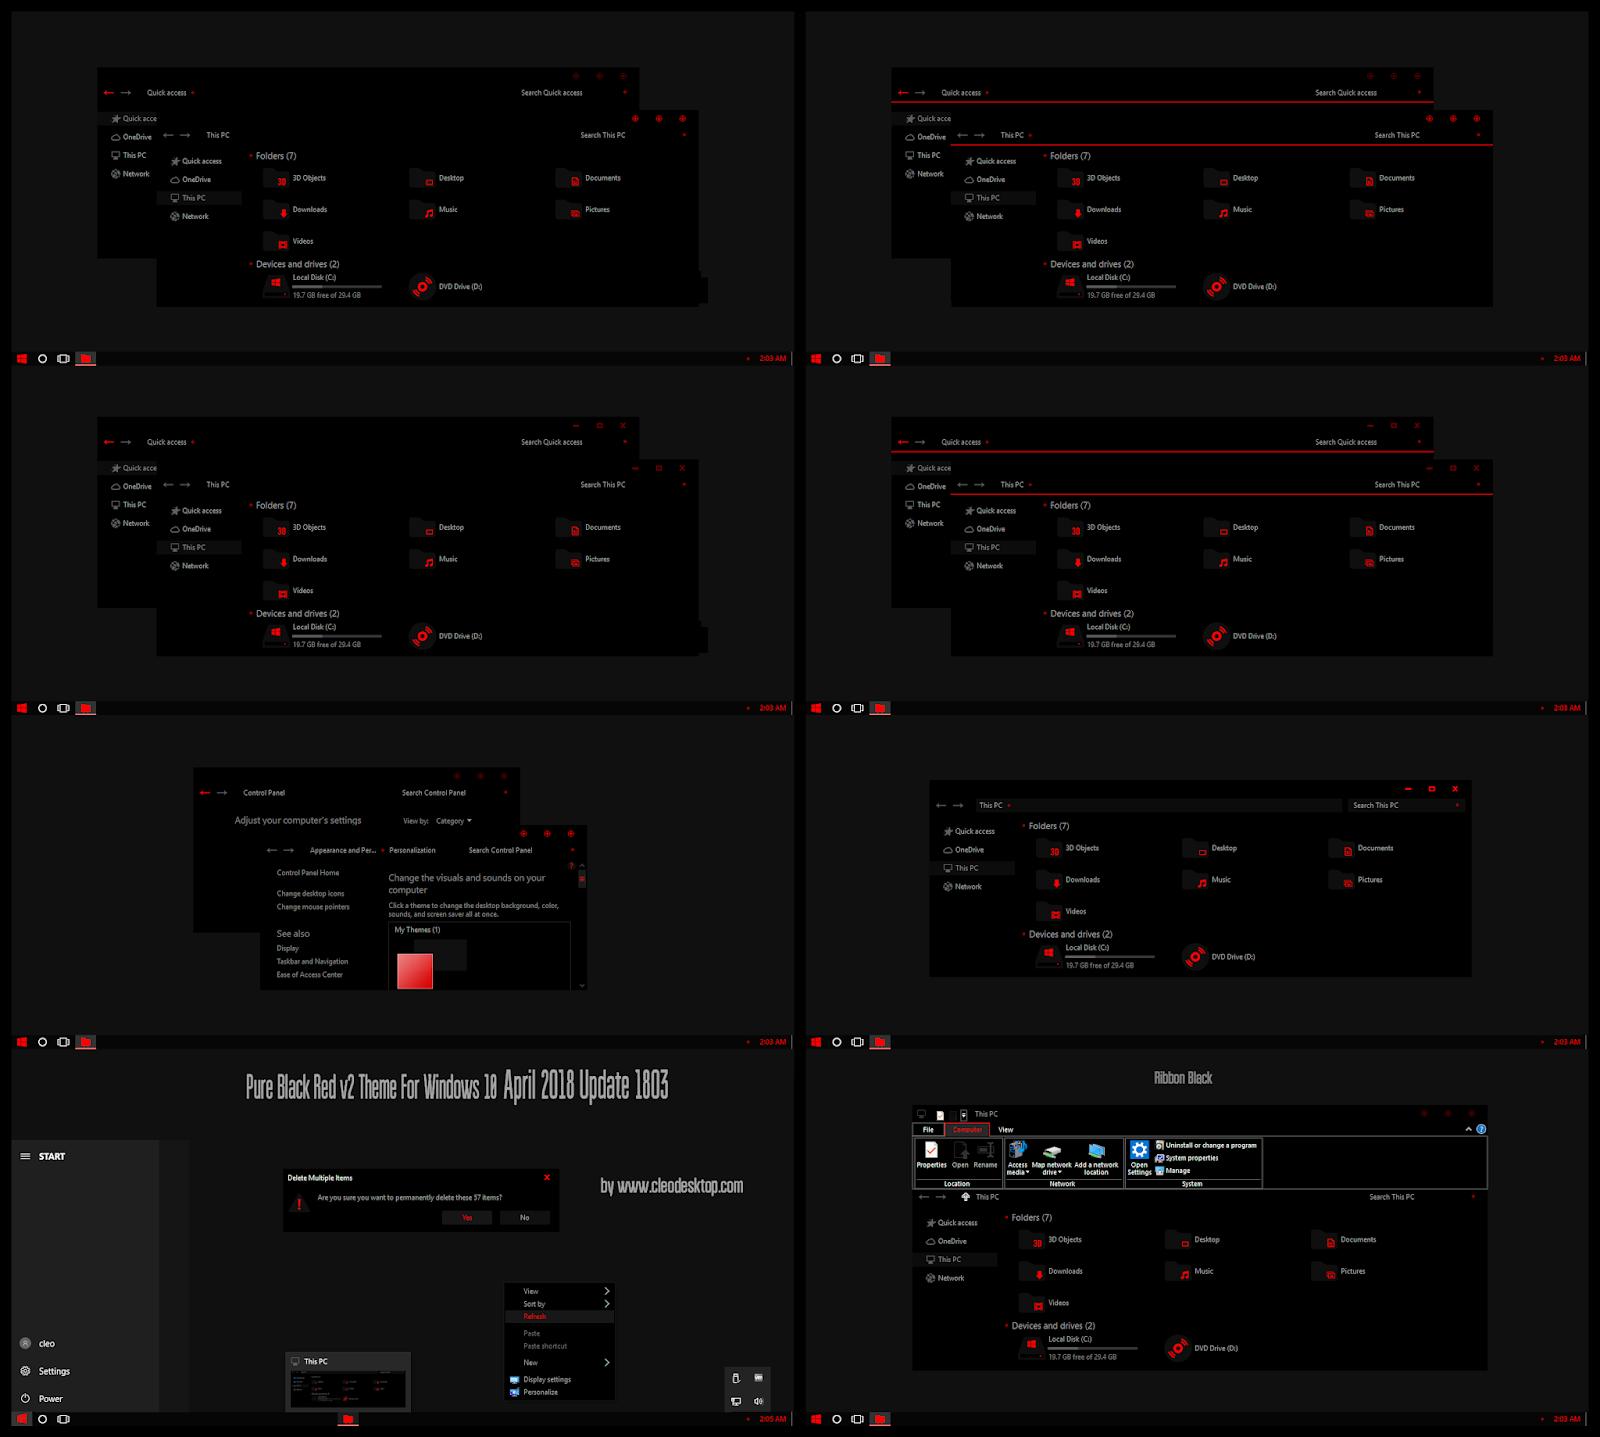 Pure Black Red V2 Theme Windows10 April 2018 Update 1803 Cleodesktop I Windows 10 Themes